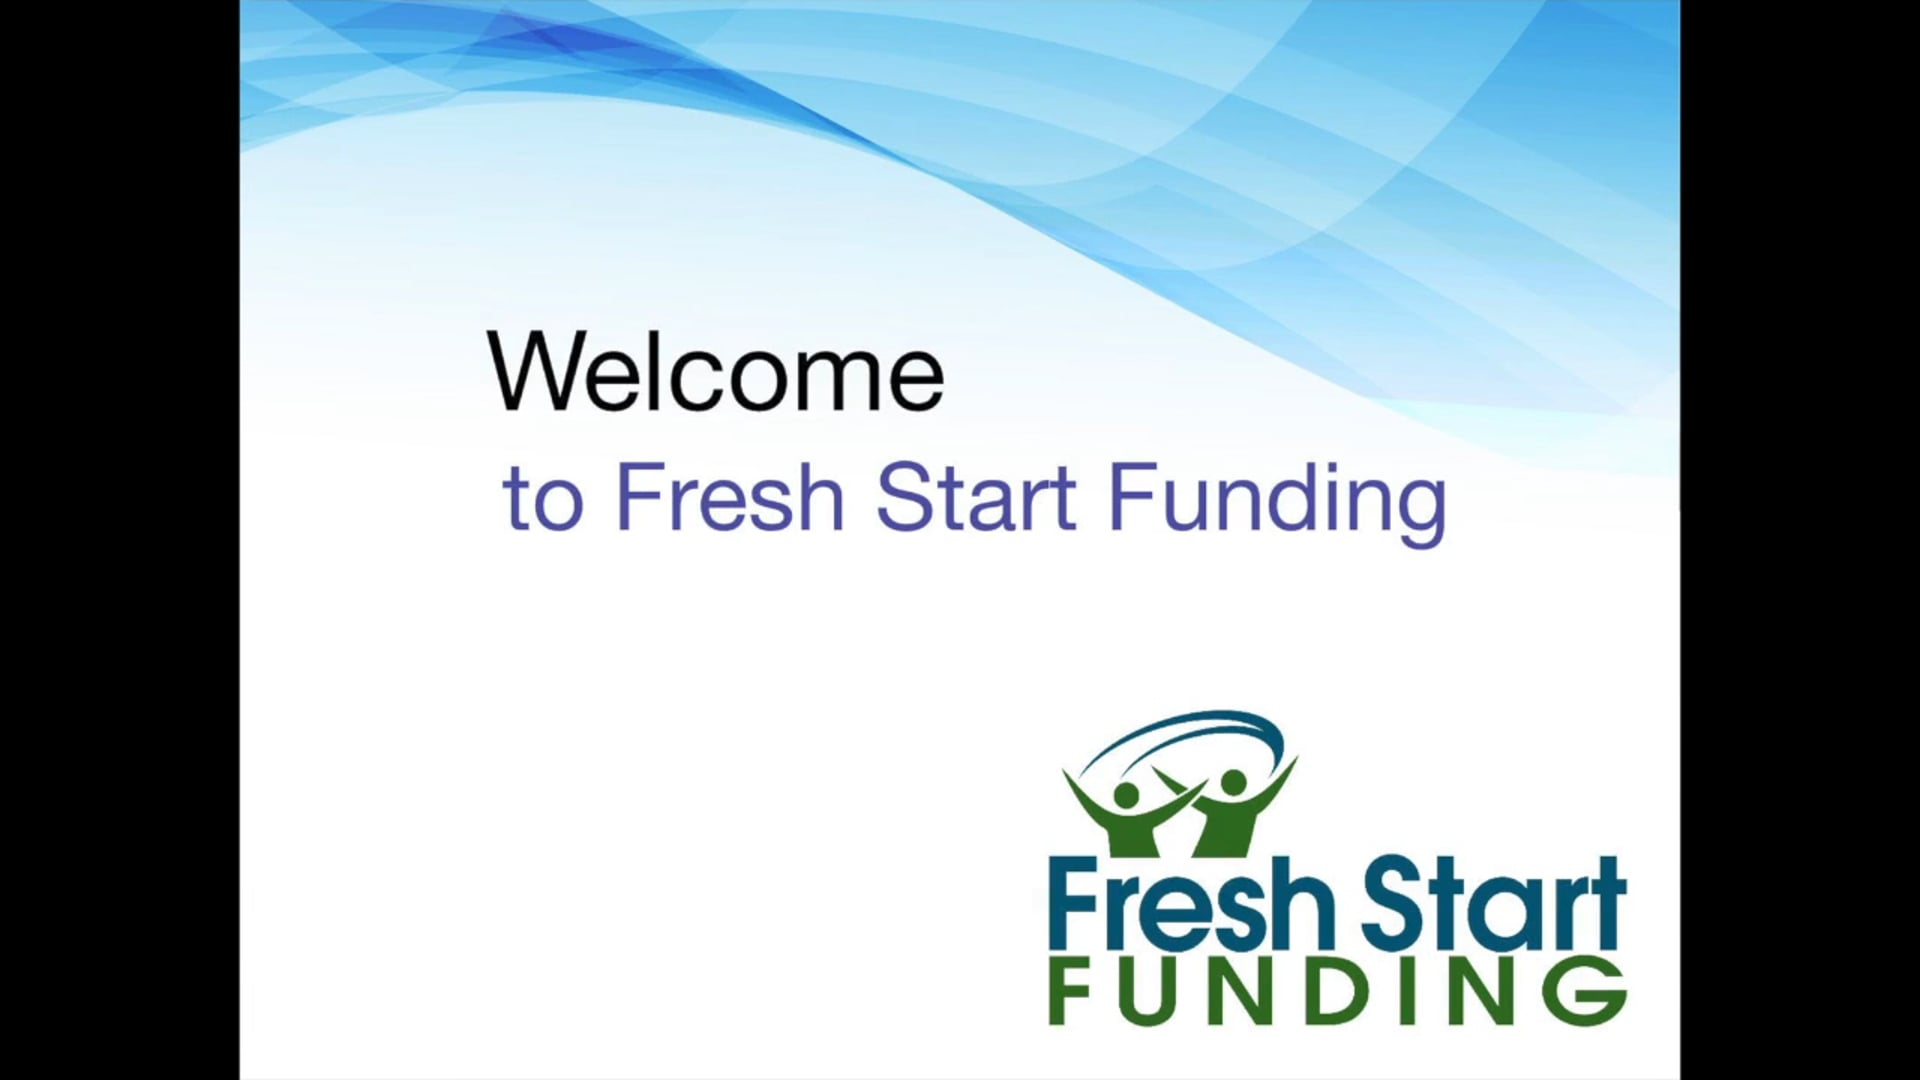 Fresh Start Funding - Welcome Video